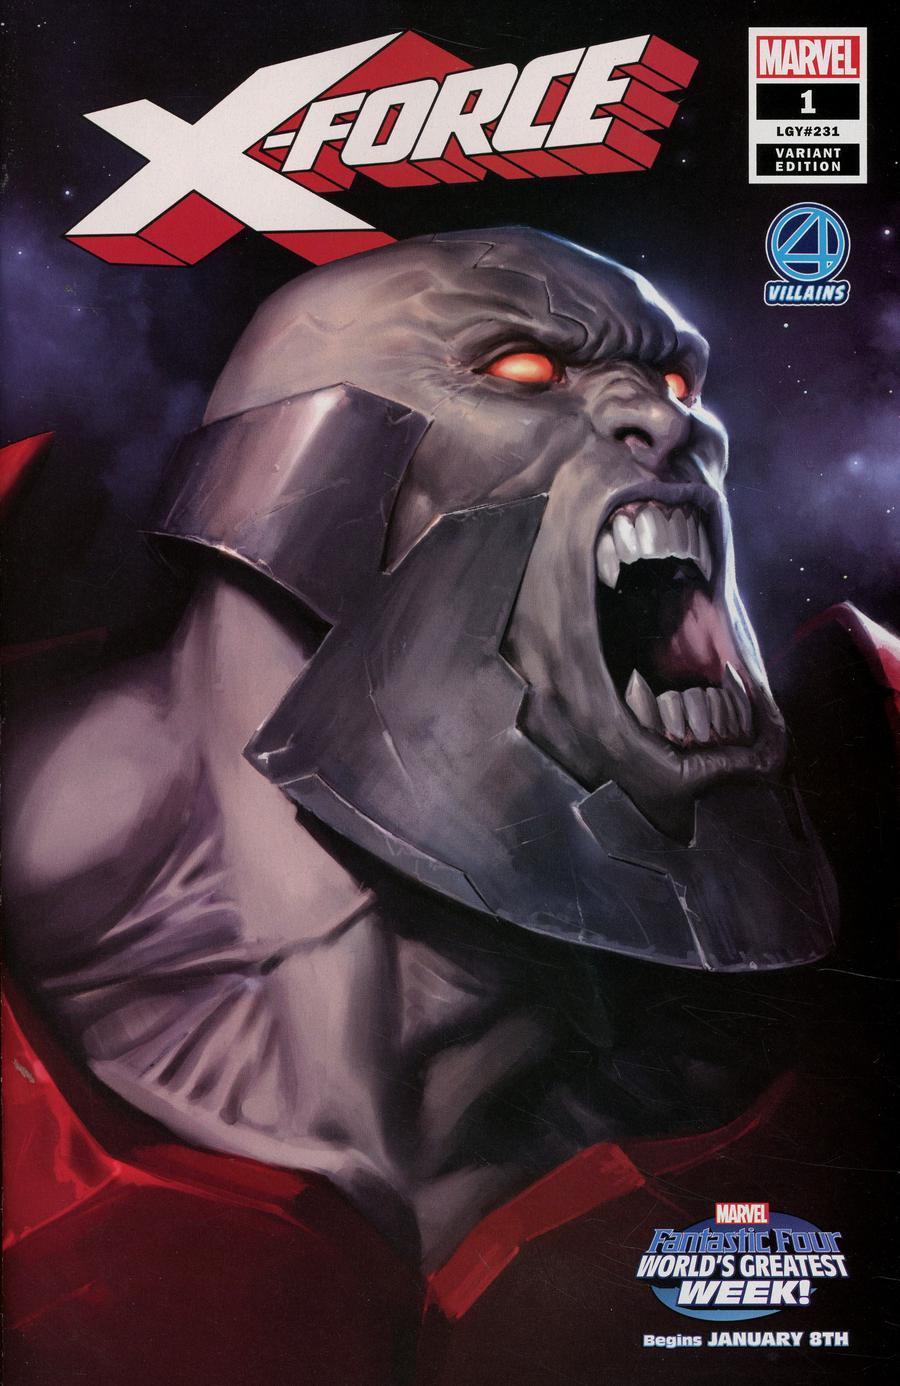 X-Force Vol 5 #1 Cover B Variant Marko Djurdjevic Fantastic Four Villains Cover